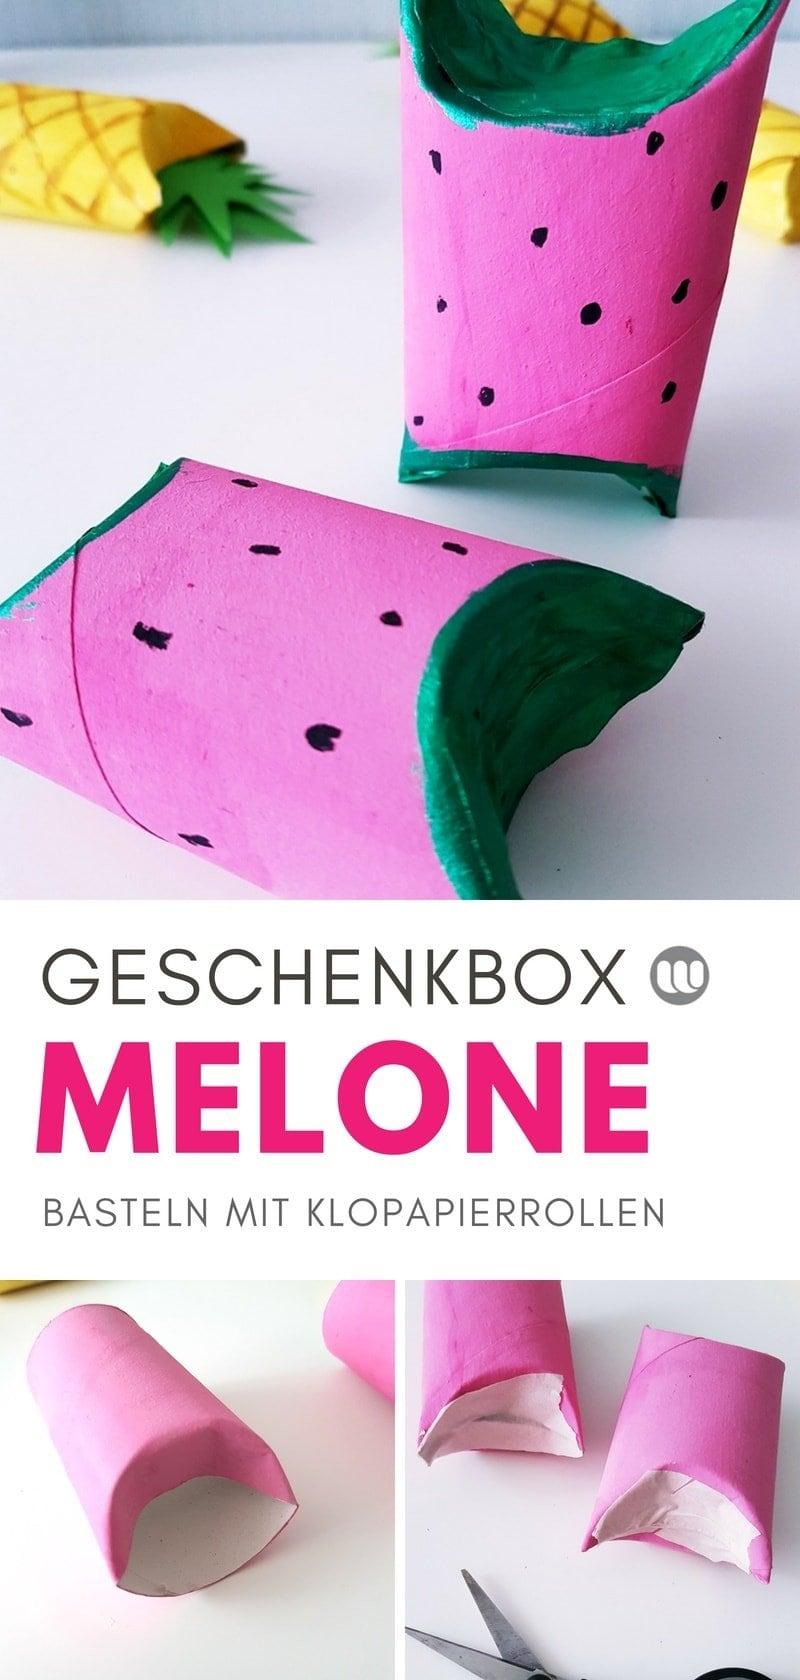 #Geschenkverpackung #Klopapierrolle #Wassermelone #Geschenkverpackung #Frucht #Geschenkbox #Kindergarten #KITA #Schule #Kinder #Kunst #DIY